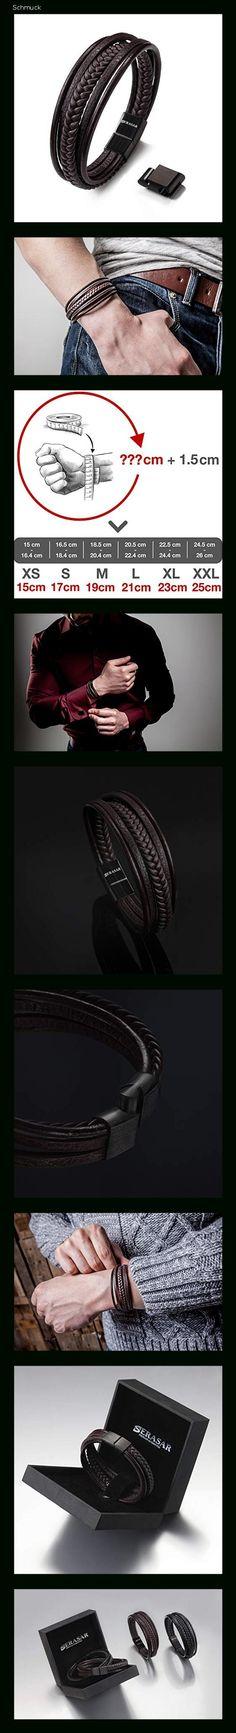 SERASAR 15cm Braun Männer-Armband Leder-Armreif Herren-Lederband Herrenarmreif Armschmuck Leder-Schmuck Herrenschmuck Flecht-Armband Leder-Wickelarmband Leder-Kette Armbändchen Men Leather Bracelet - 14fi